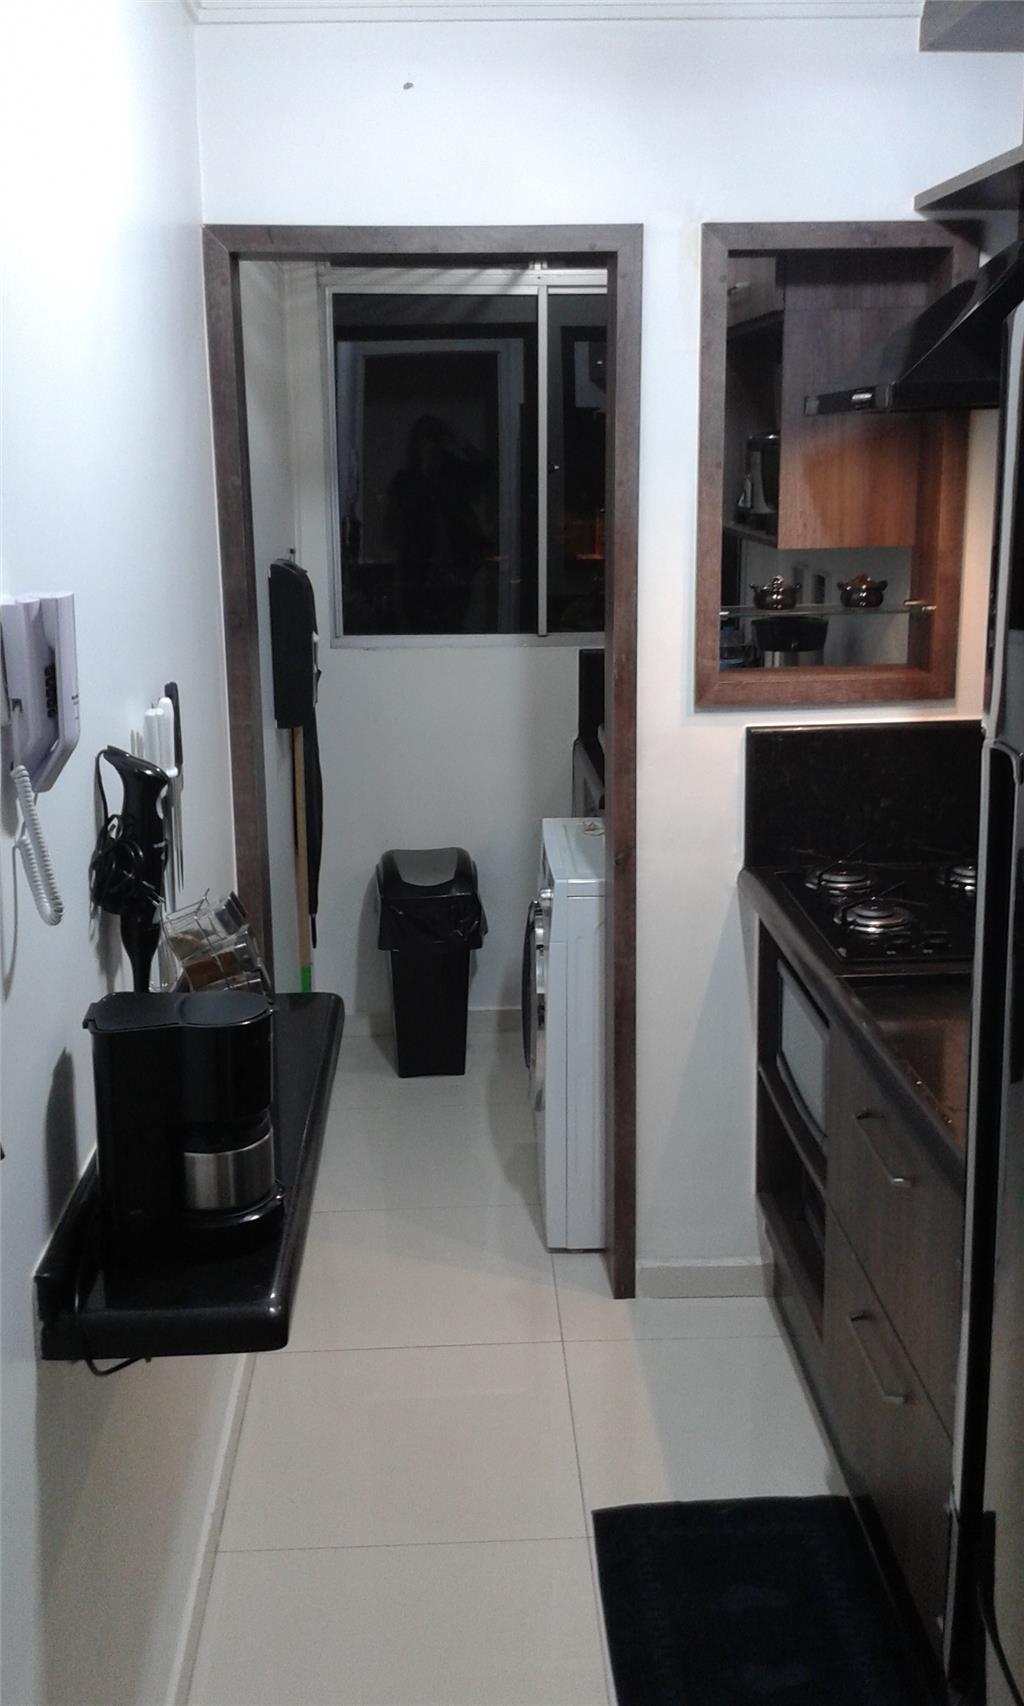 Soute Imóveis - Apto 2 Dorm, Guarulhos (AP2610) - Foto 10